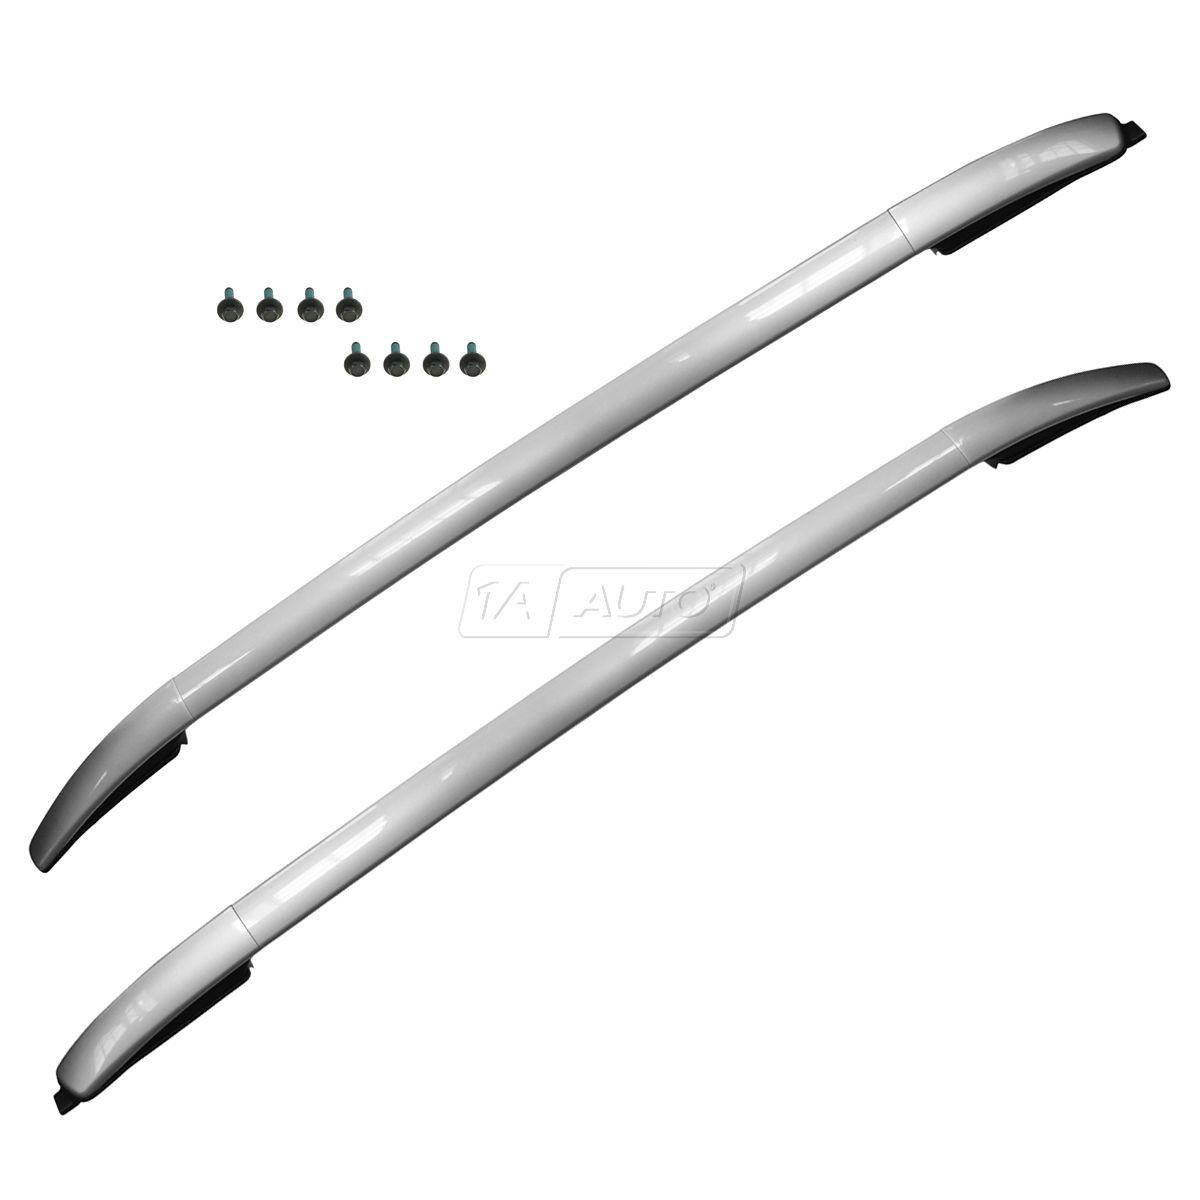 Roof Rack Side Rails: OEM Roof Rack Side Rail Pair Set For 13-15 Mazda CX-5 CX5